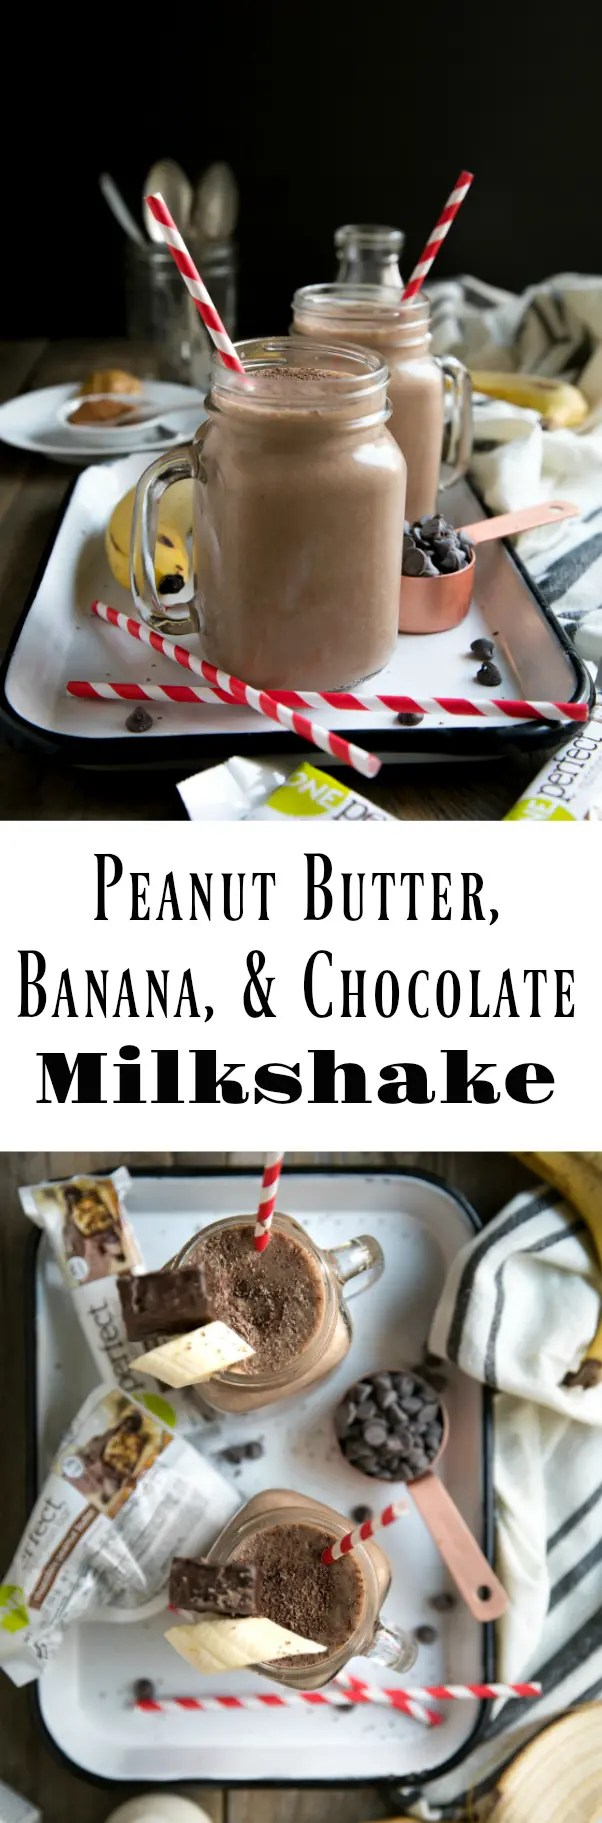 Peanut Butter Banana and Chocolate ZonePerfect Nutrition Bar Milkshake #ad #zoneperfect #milkshake #healthy #breakfast #snack #dessert #smoothie via @theforkedspoon